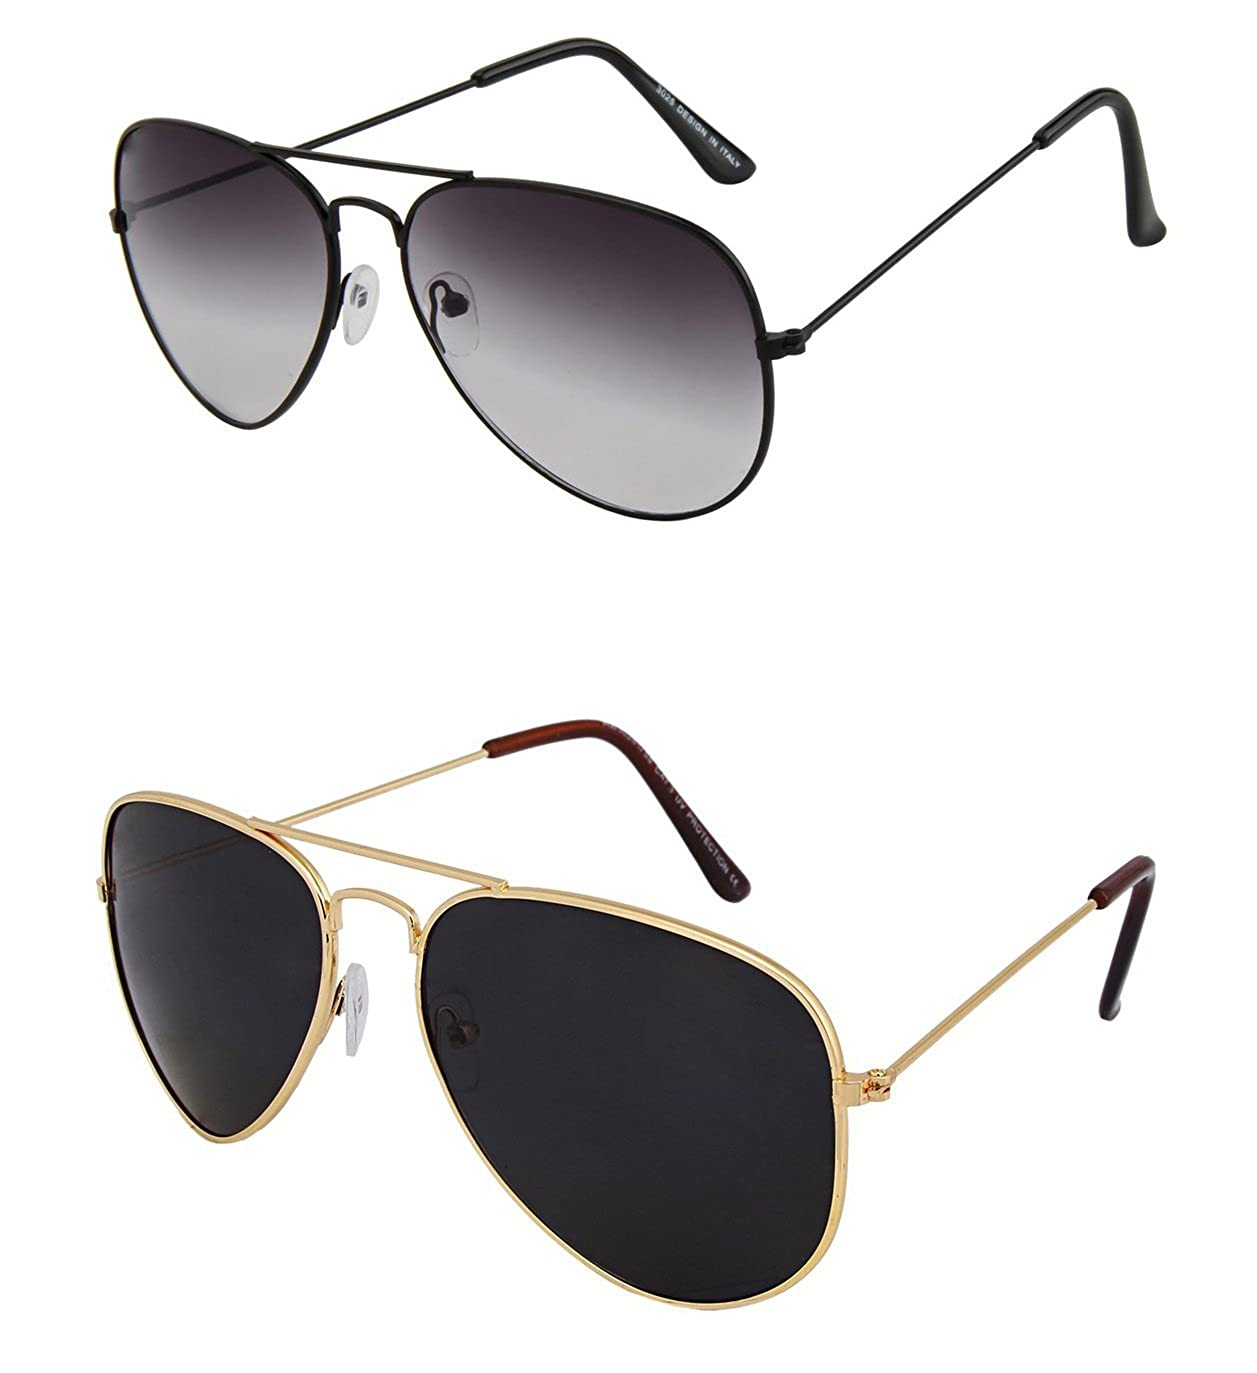 534920d8298 Shvas Uv Protected Aviator Unisex Sunglasses(Avgreyavgblack